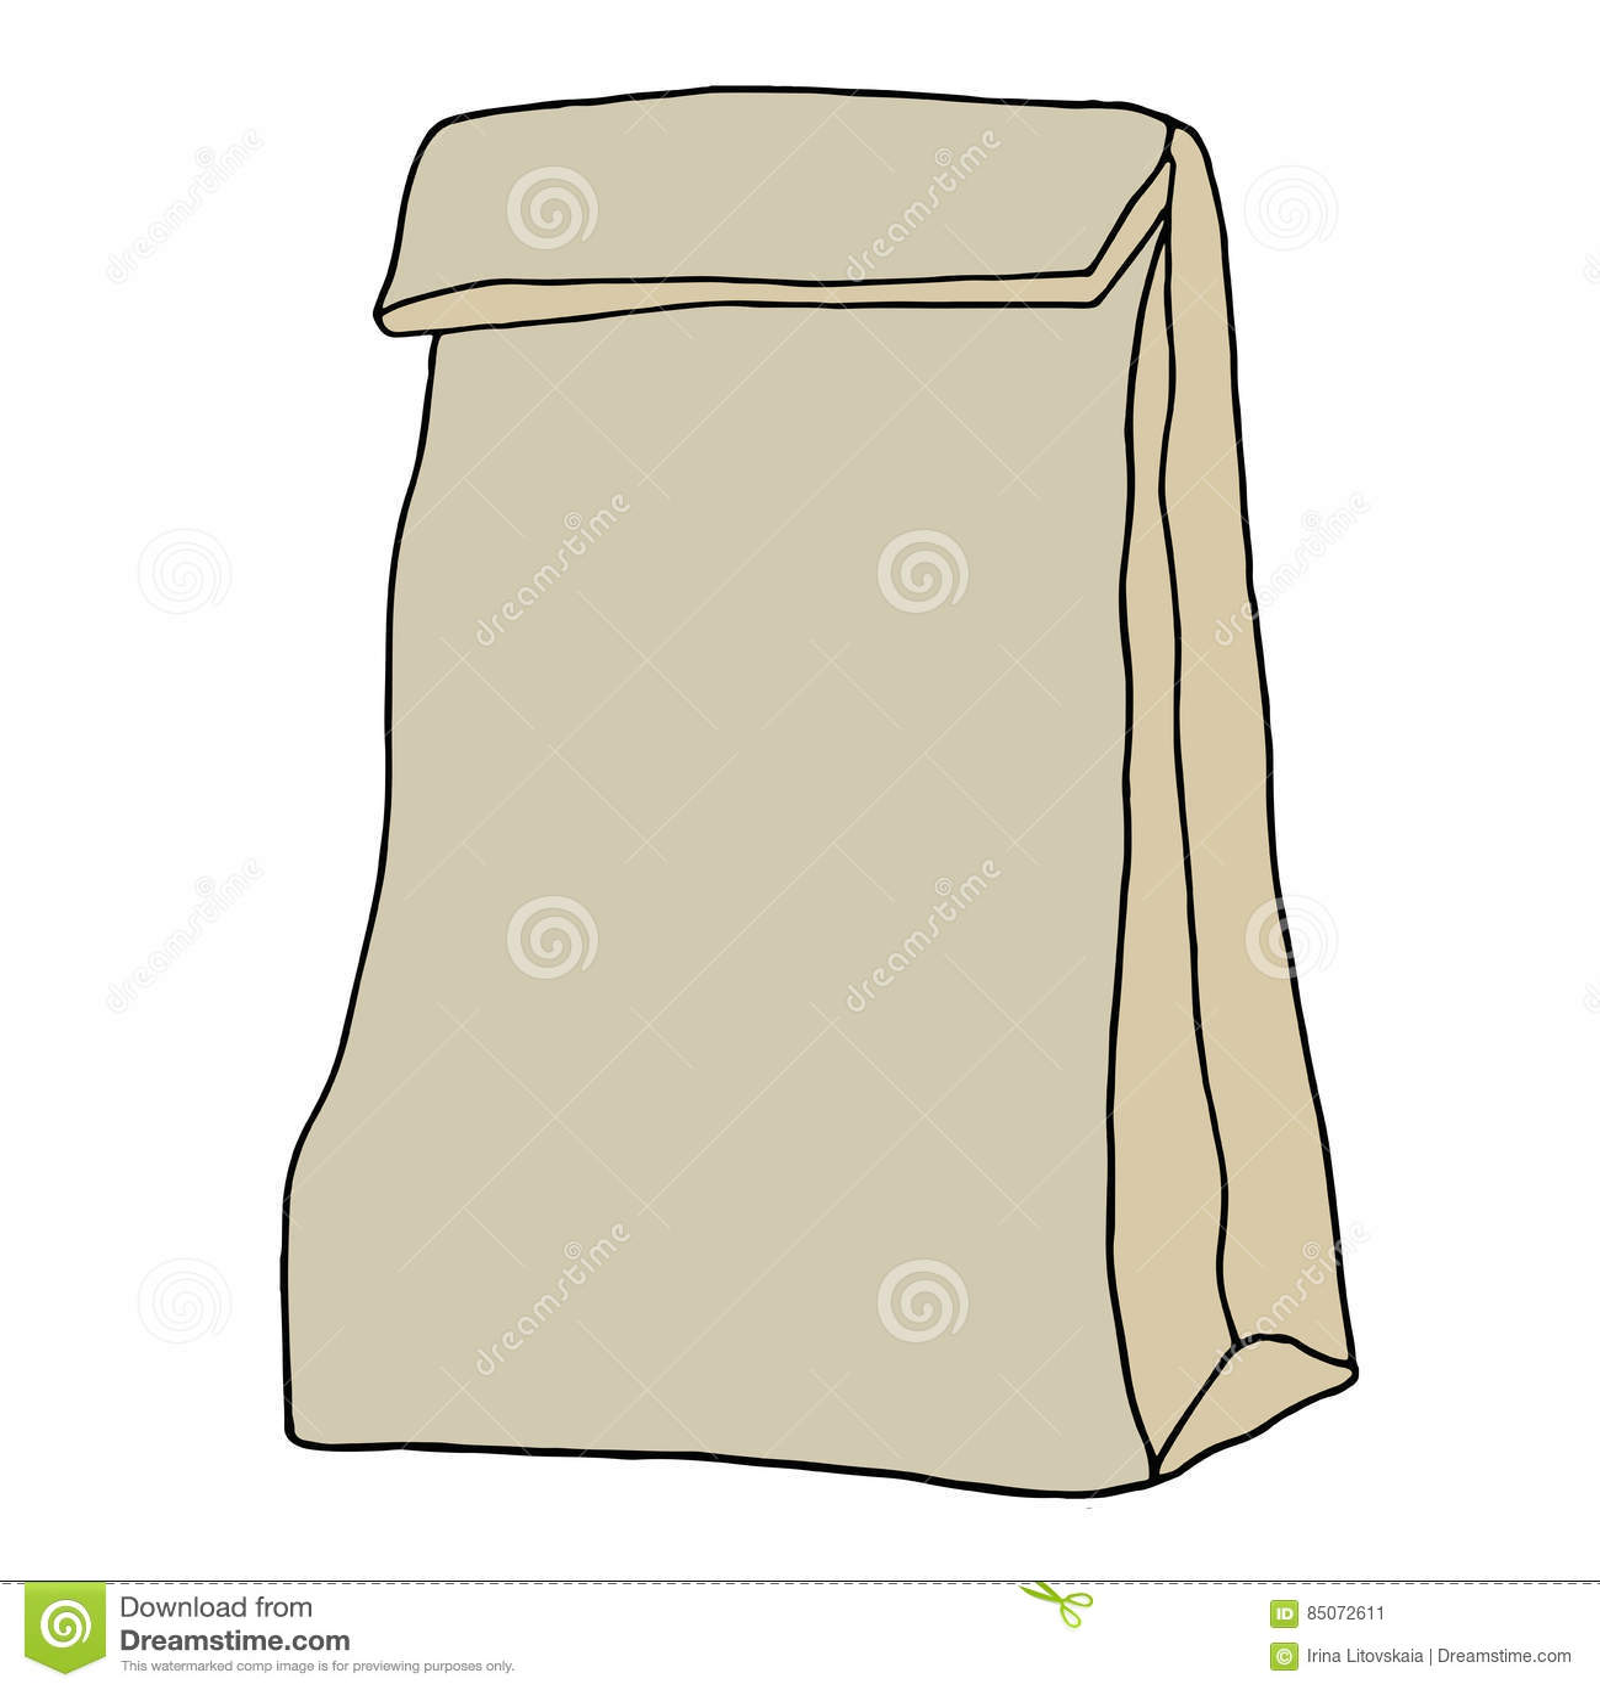 Paper bag sketch - Brown Paper Lunch Bag Hand Drawn Sketch